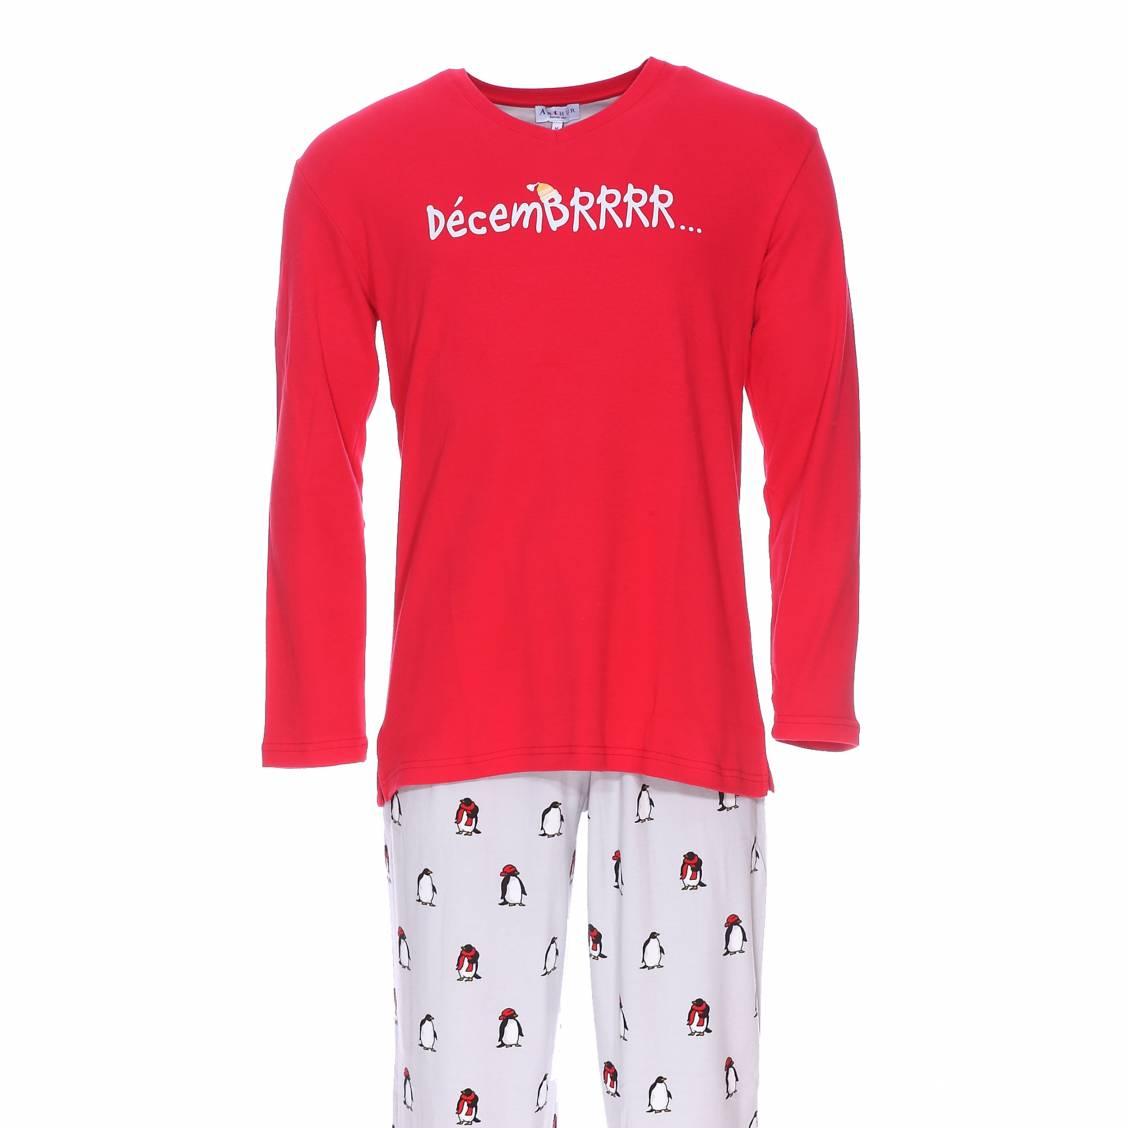 Pyjama long  : tee-shirt manches longues rouge à impression \